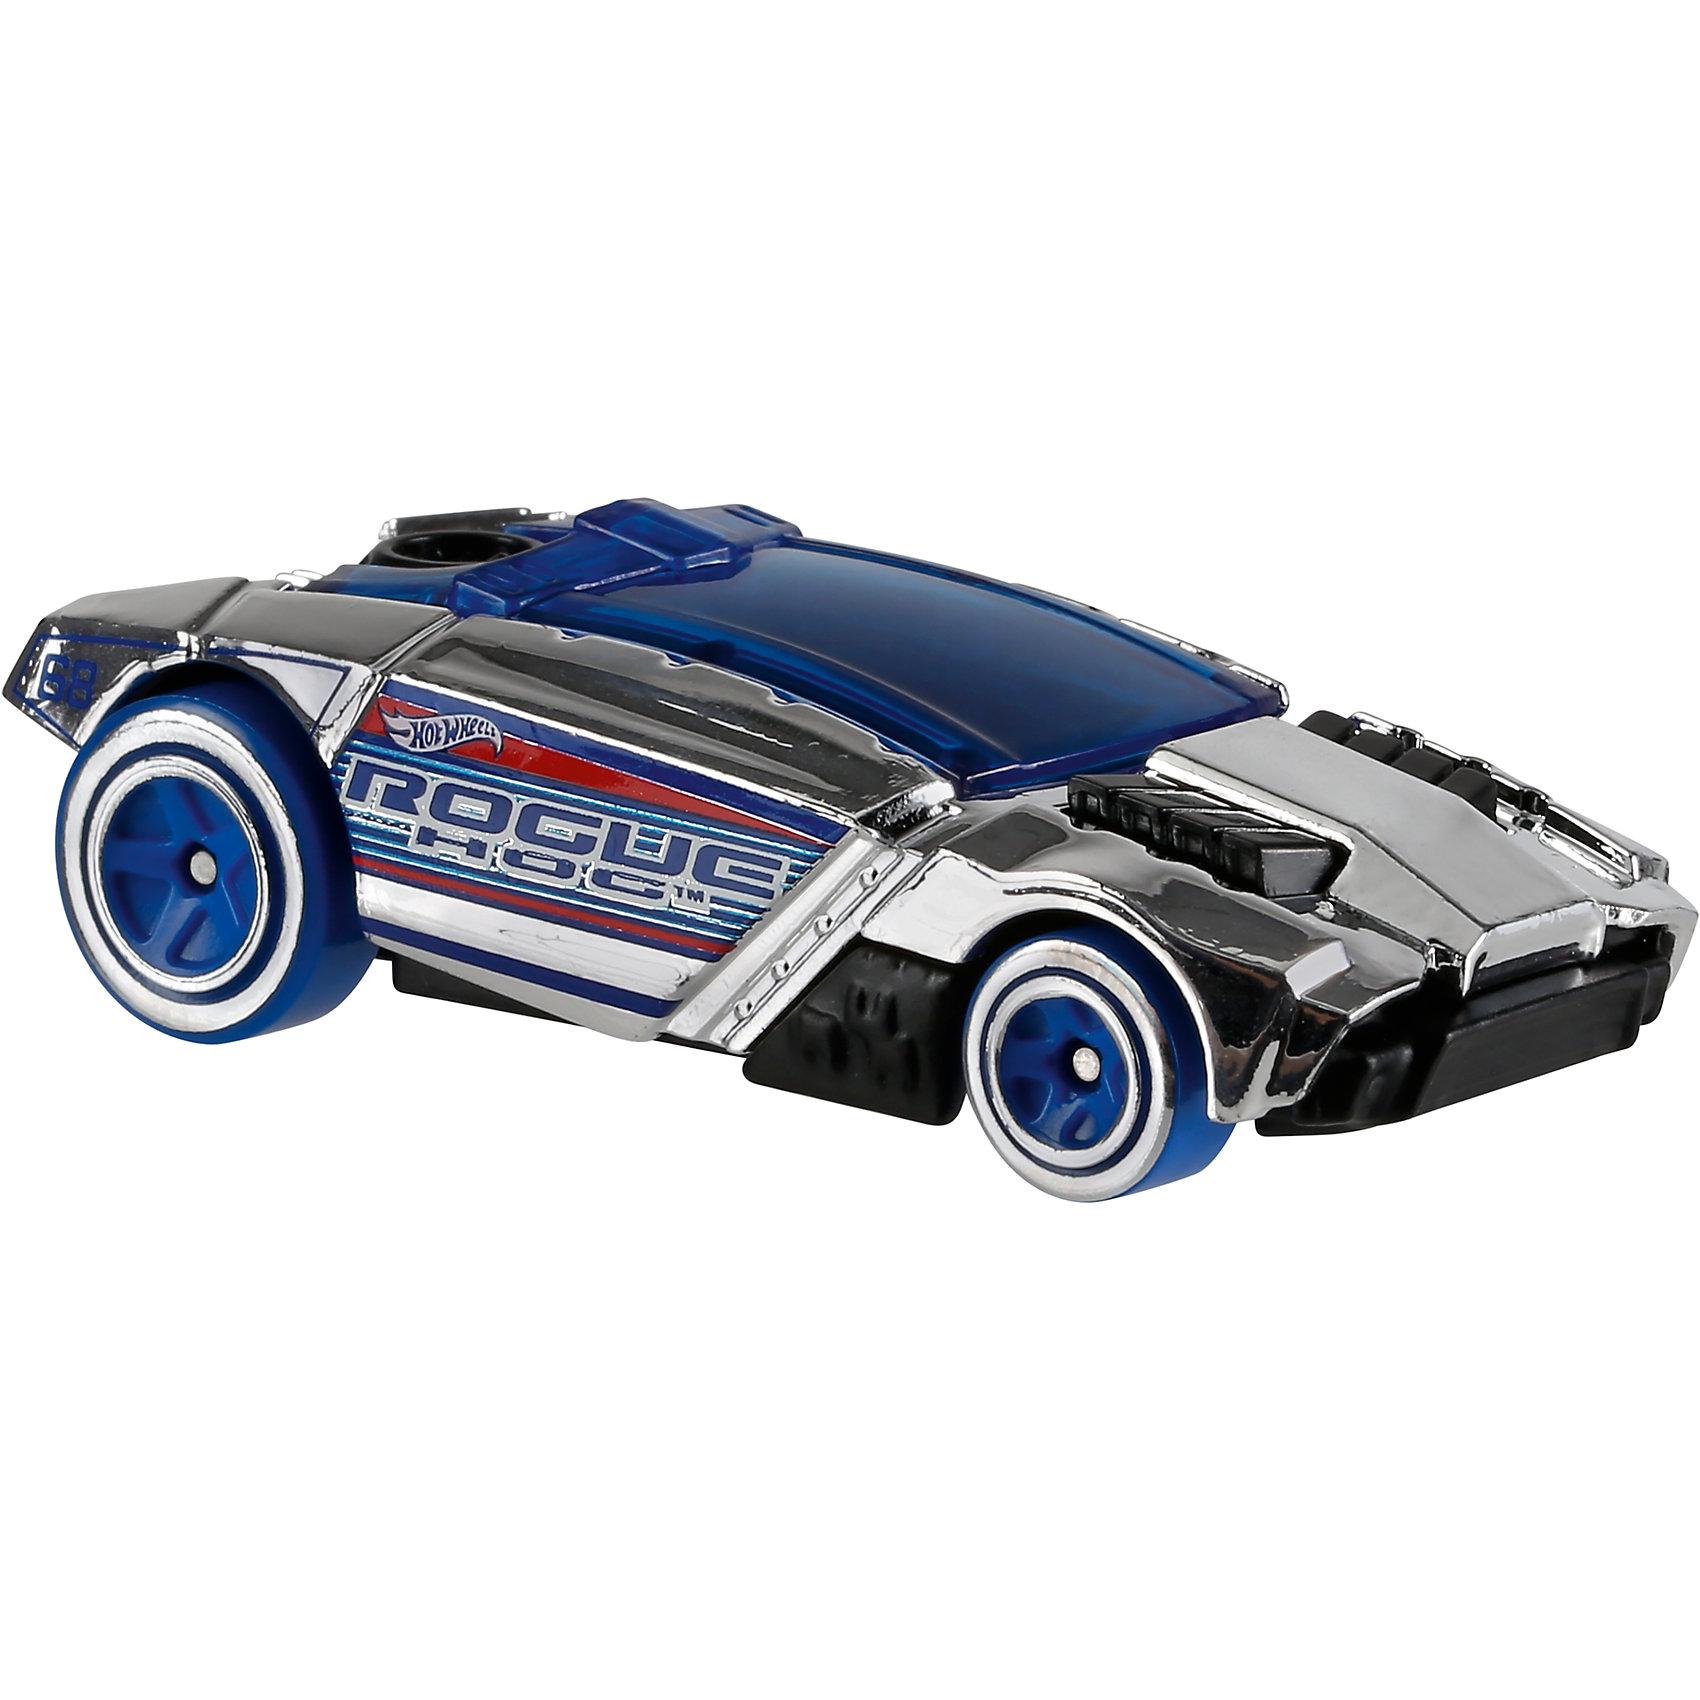 Базовая машинка Hot Wheels, Rogue HogПопулярные игрушки<br><br><br>Ширина мм: 110<br>Глубина мм: 45<br>Высота мм: 110<br>Вес г: 30<br>Возраст от месяцев: 36<br>Возраст до месяцев: 96<br>Пол: Мужской<br>Возраст: Детский<br>SKU: 7142073